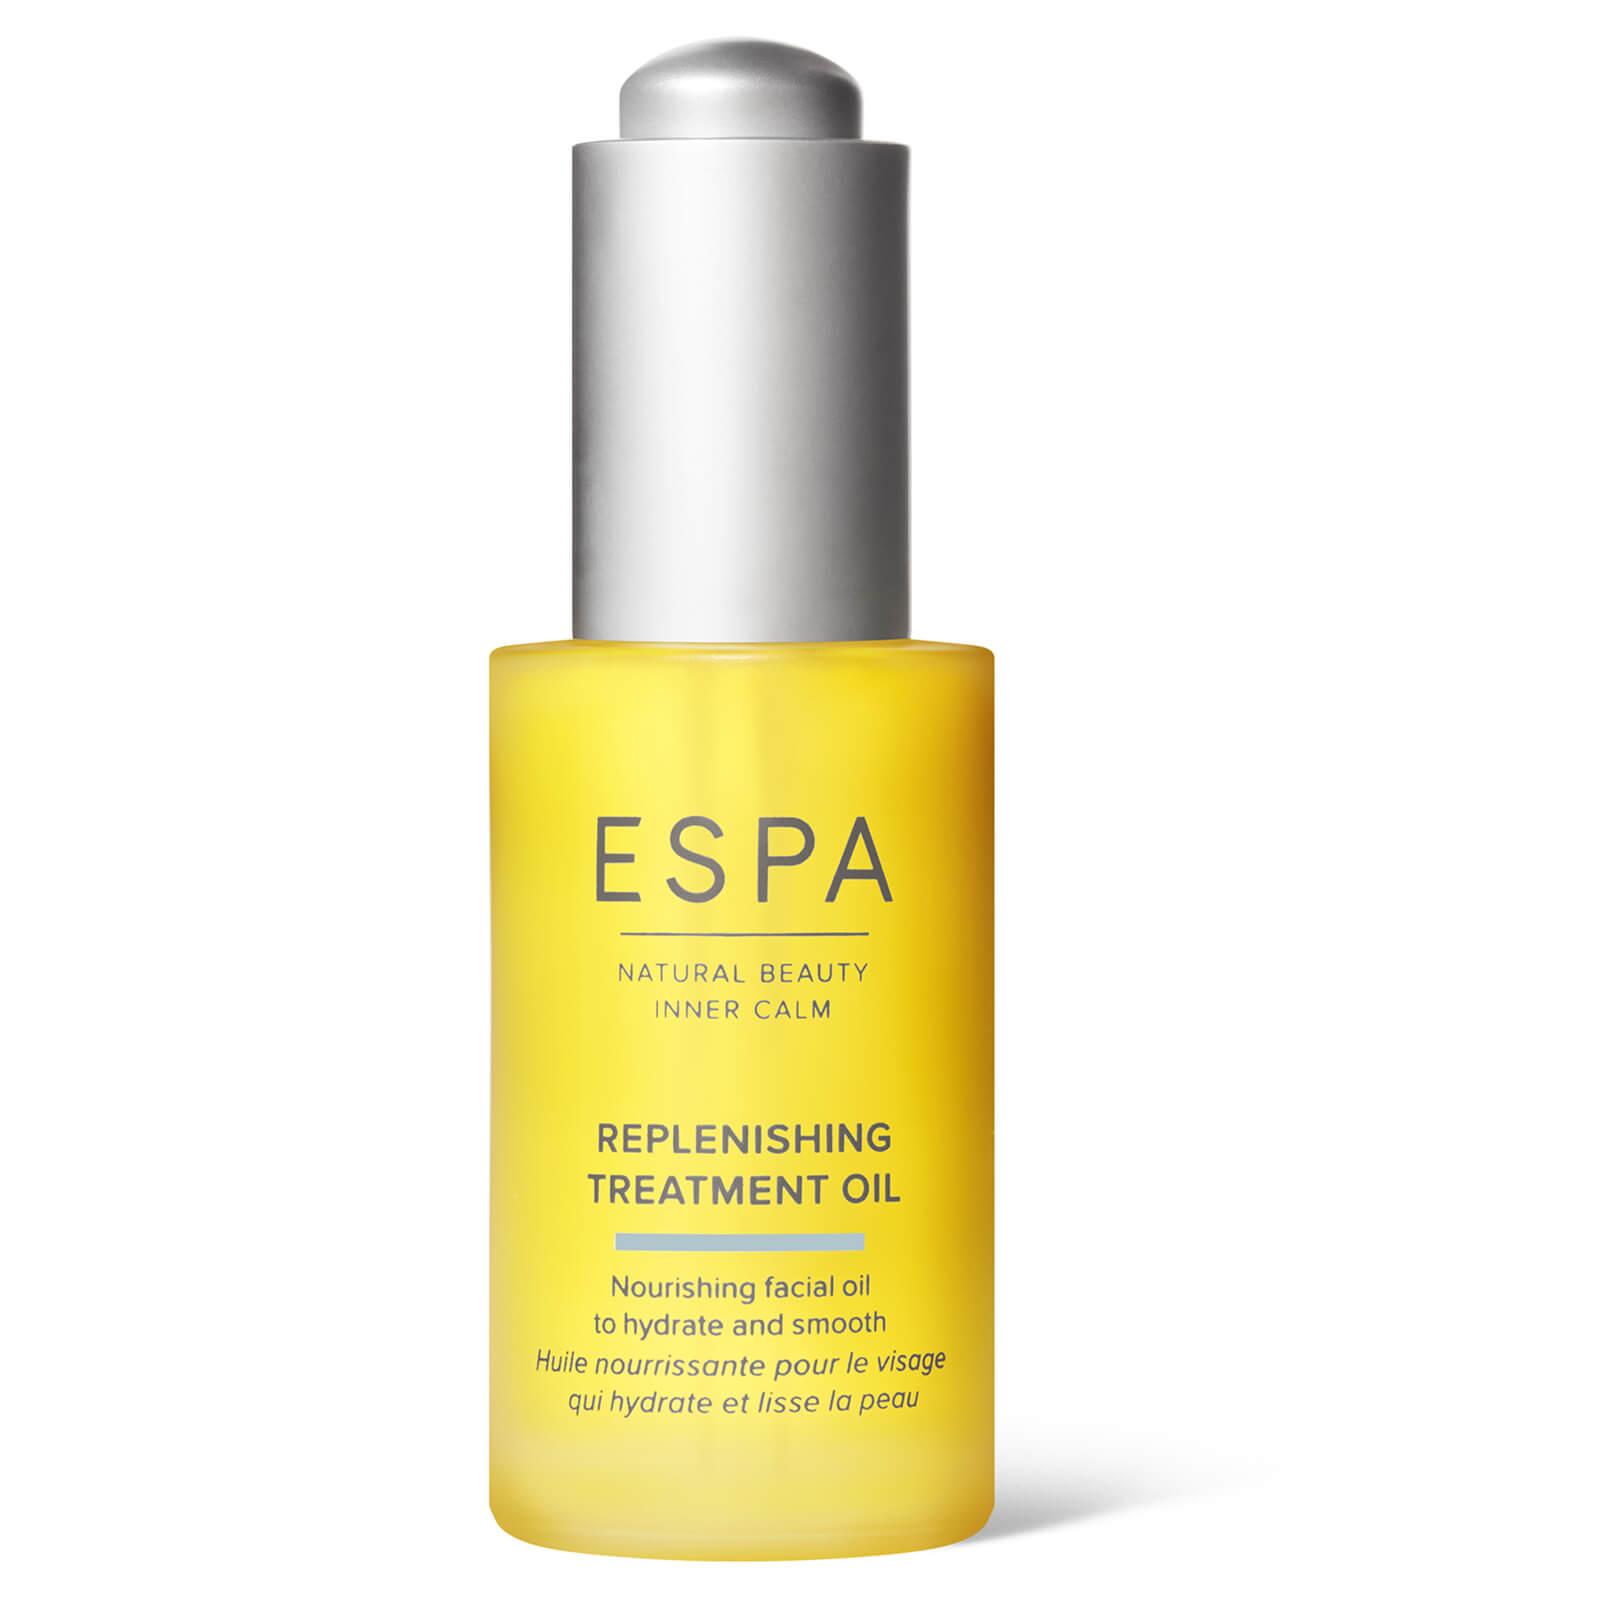 ESPA Replenishing Treatment Oil